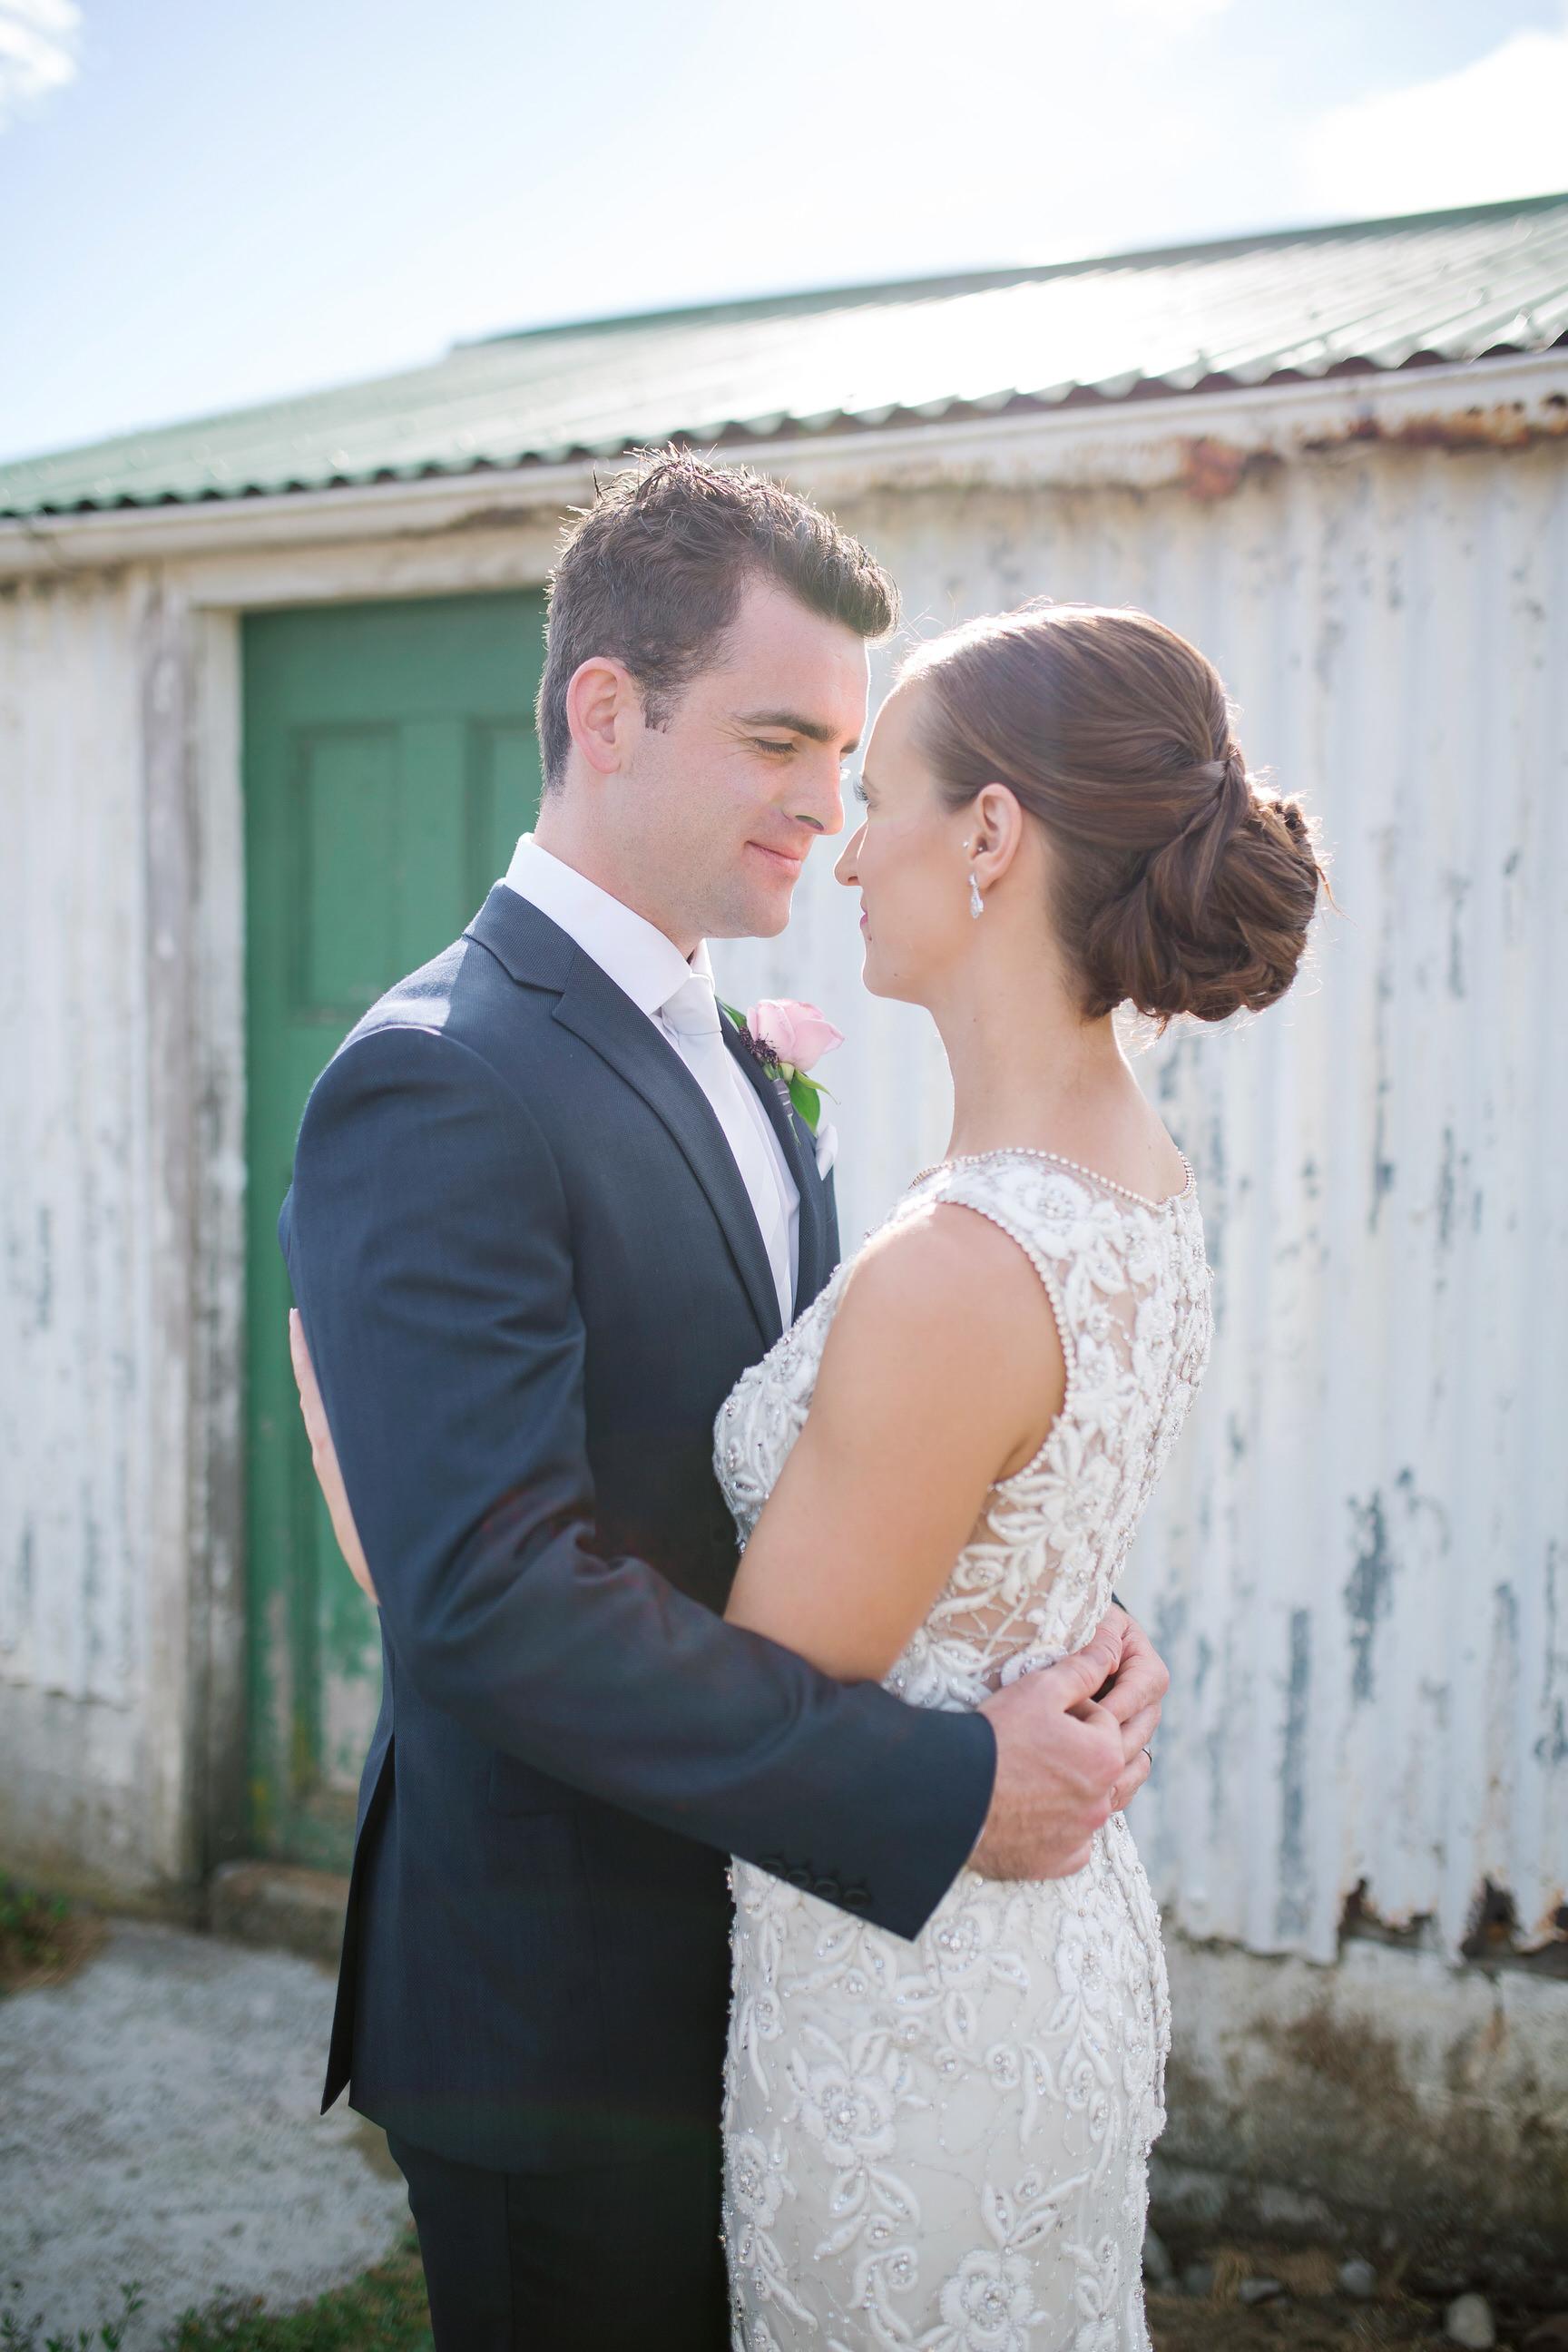 Martinborough-Poppies-Wedding-Caine-Eloise-Toni-Larsen-0099.jpg